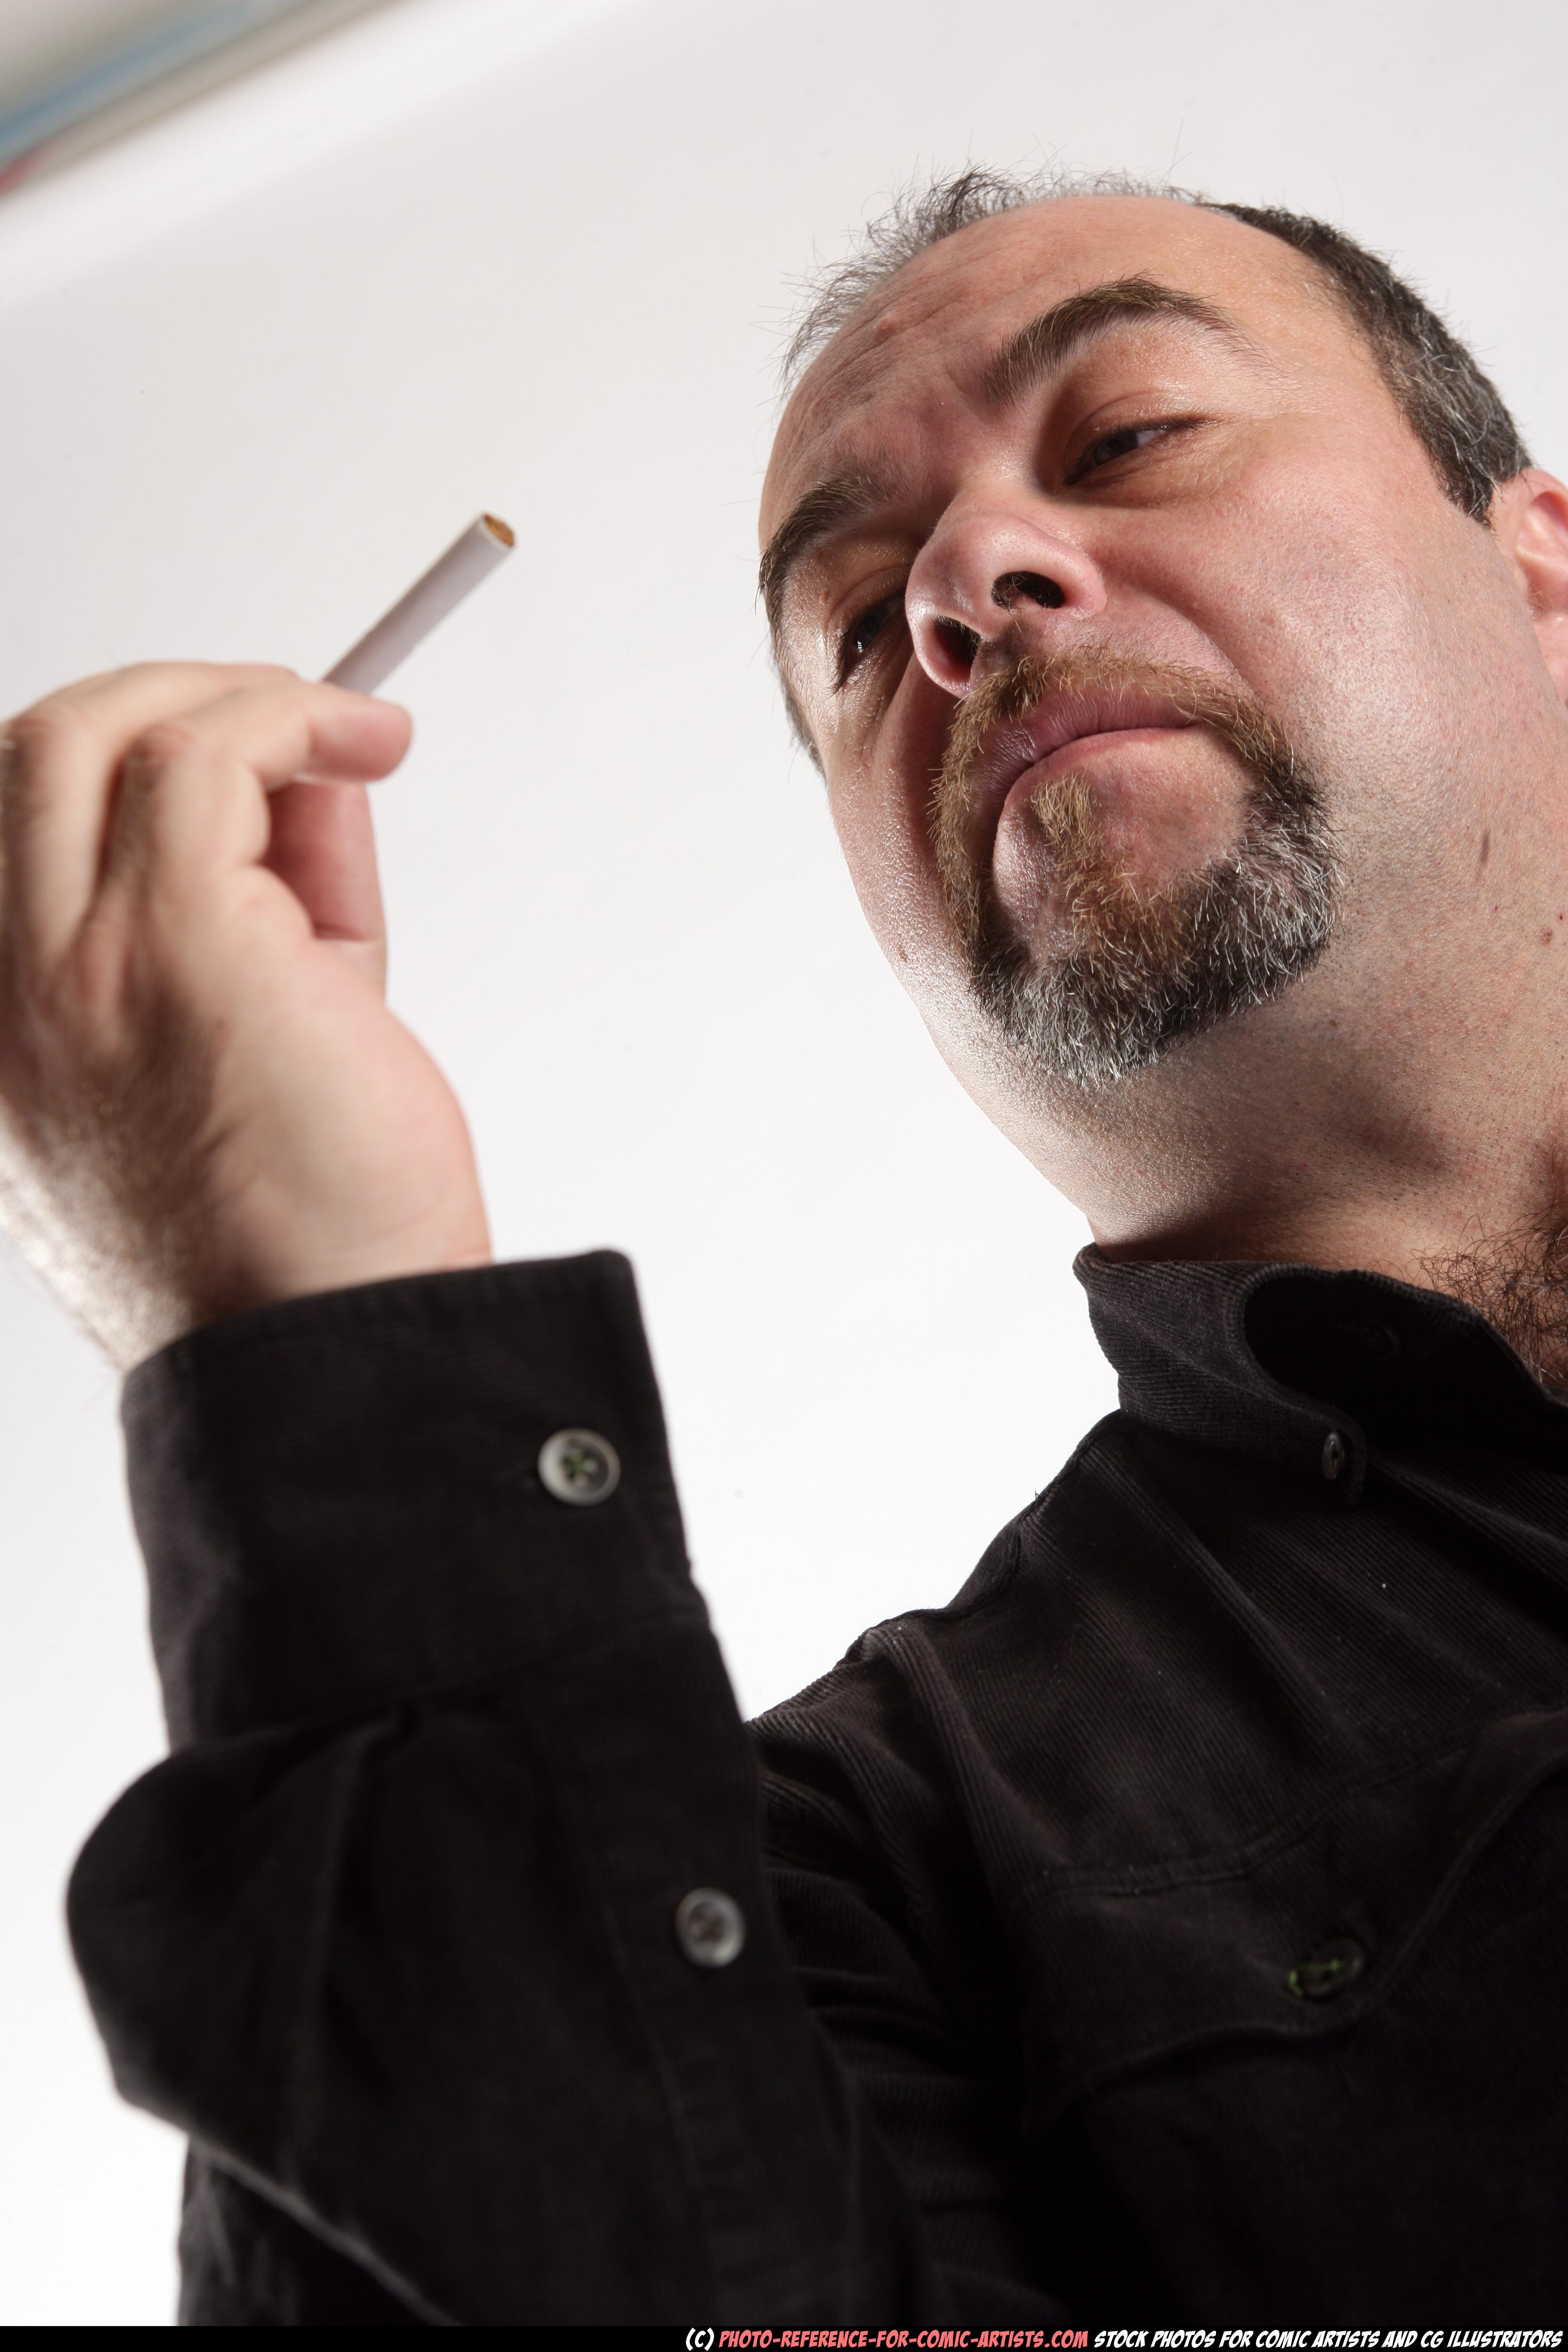 Gangsta with cigarette